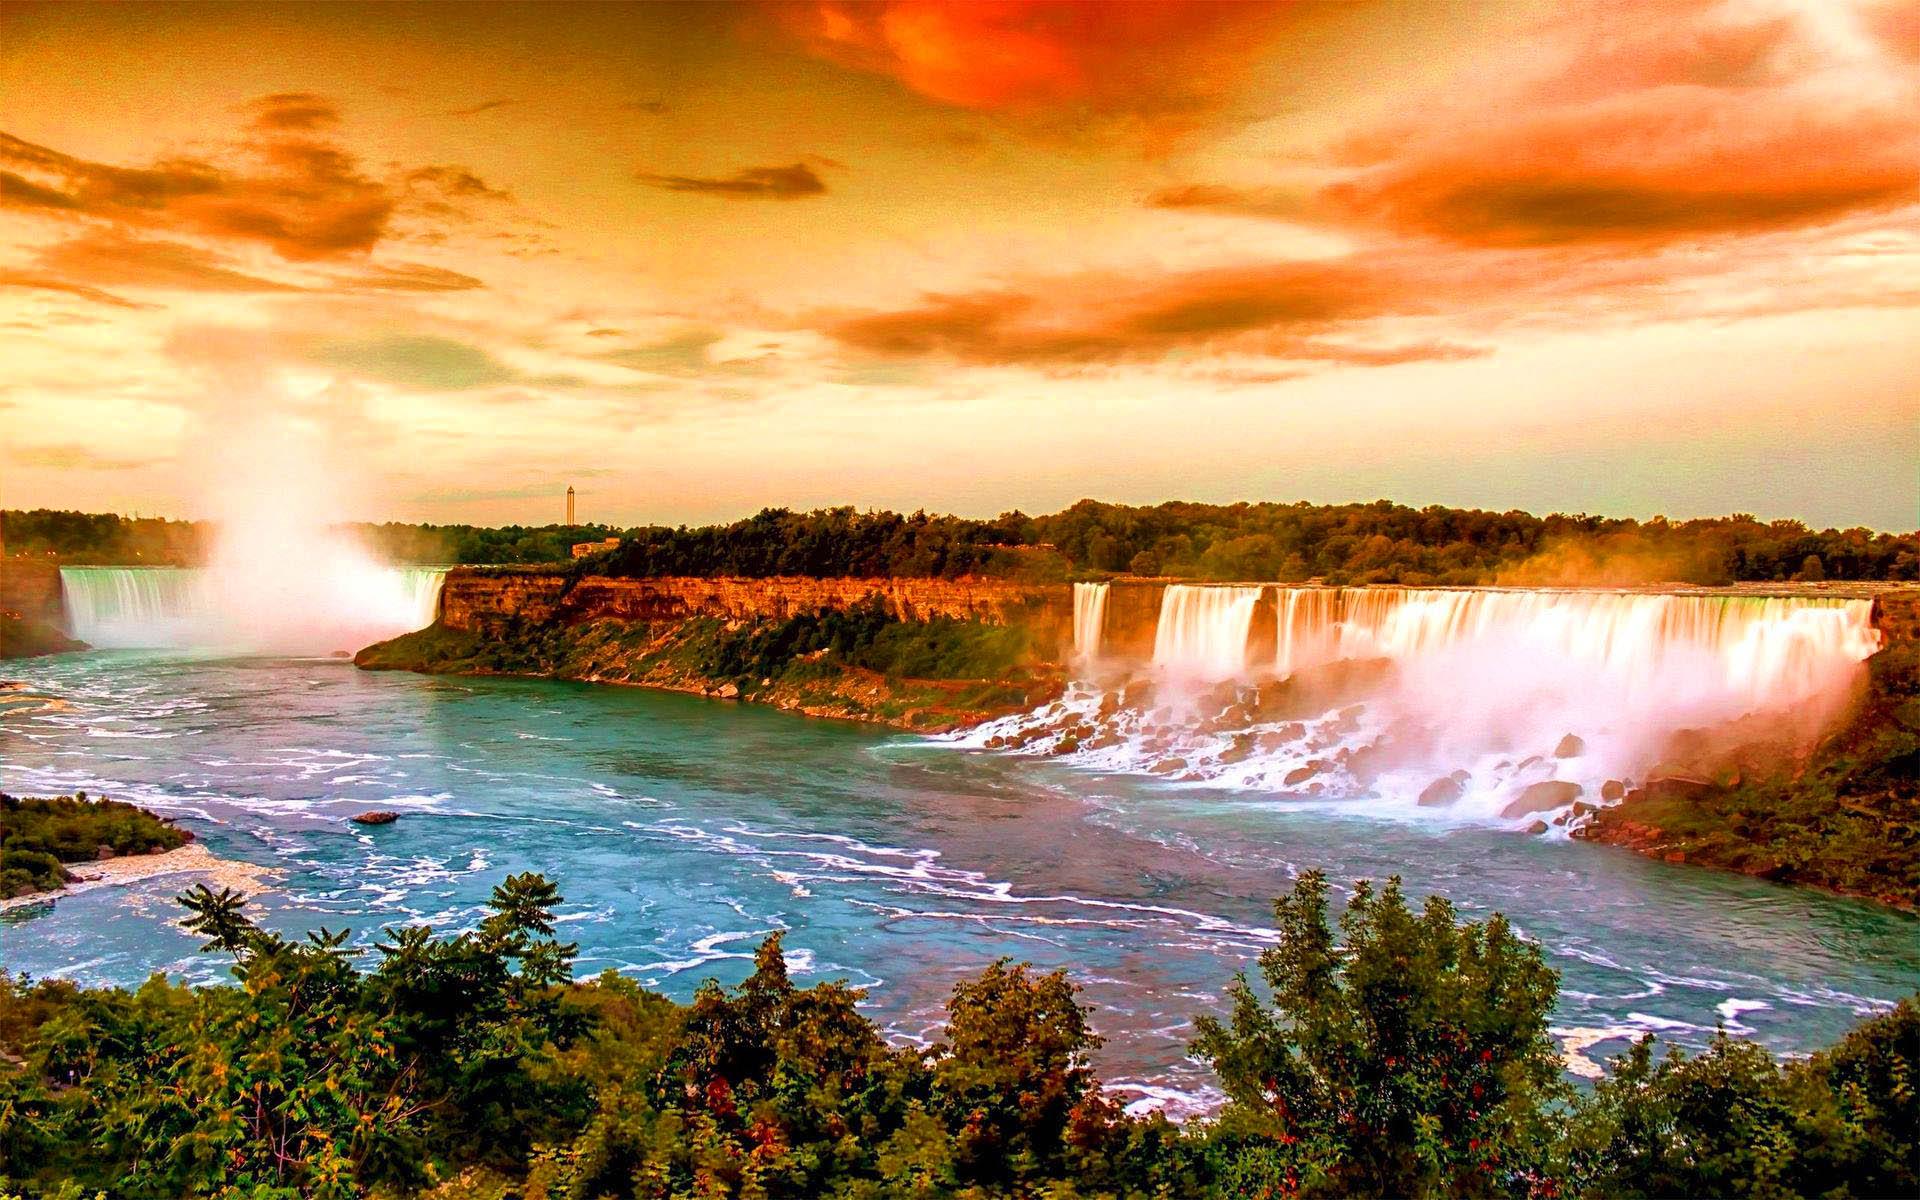 Hd Beautiful Nature Wallpapers Desktop backgrounds Free ...